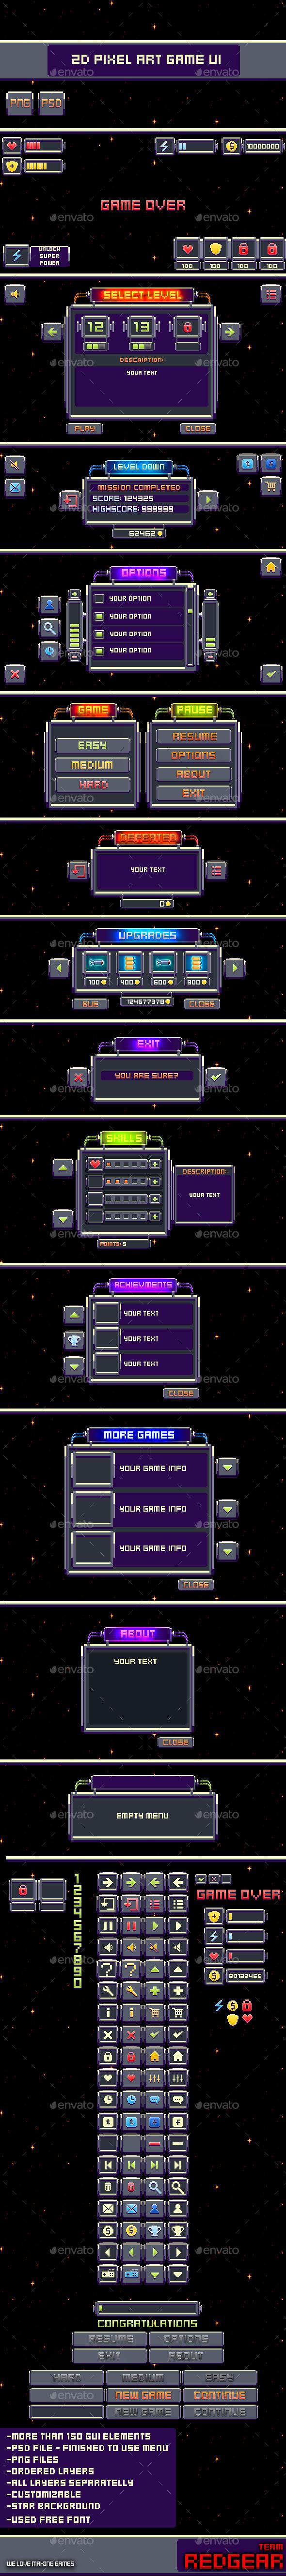 2D Pixel Art Game UI - User Interfaces Game Assets